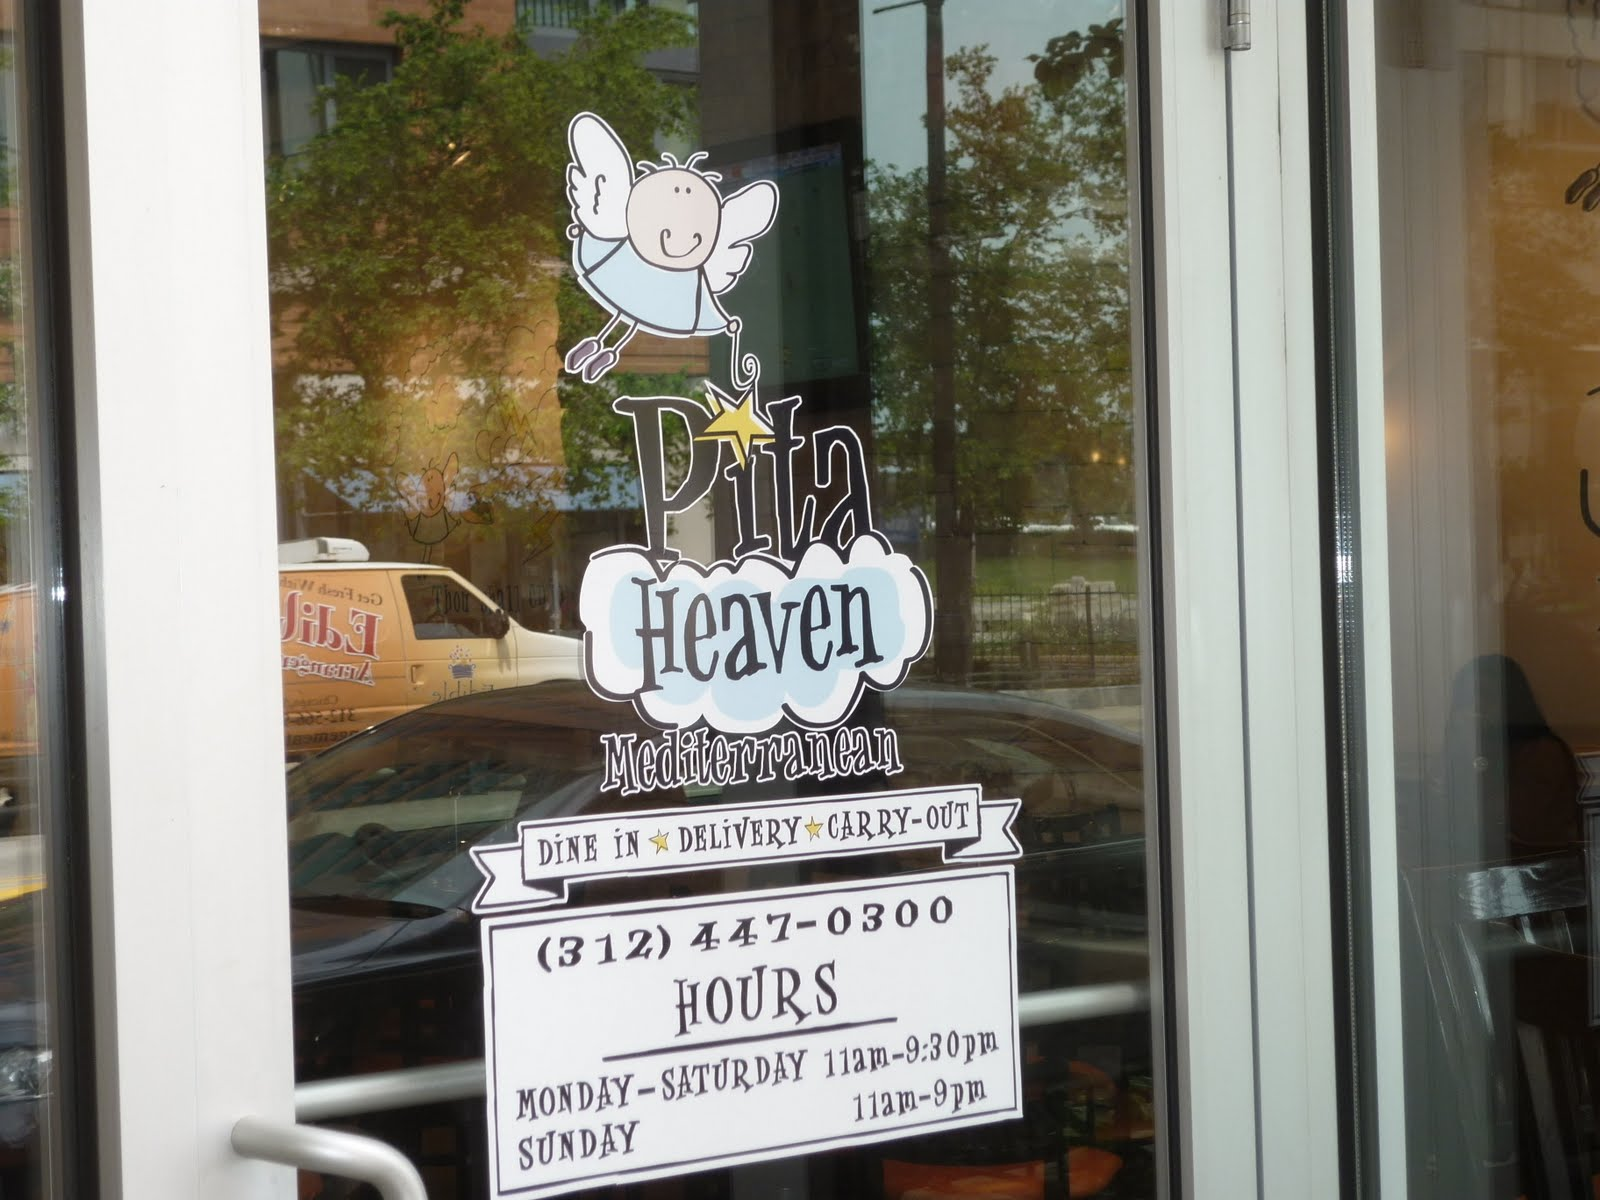 Pita Heaven